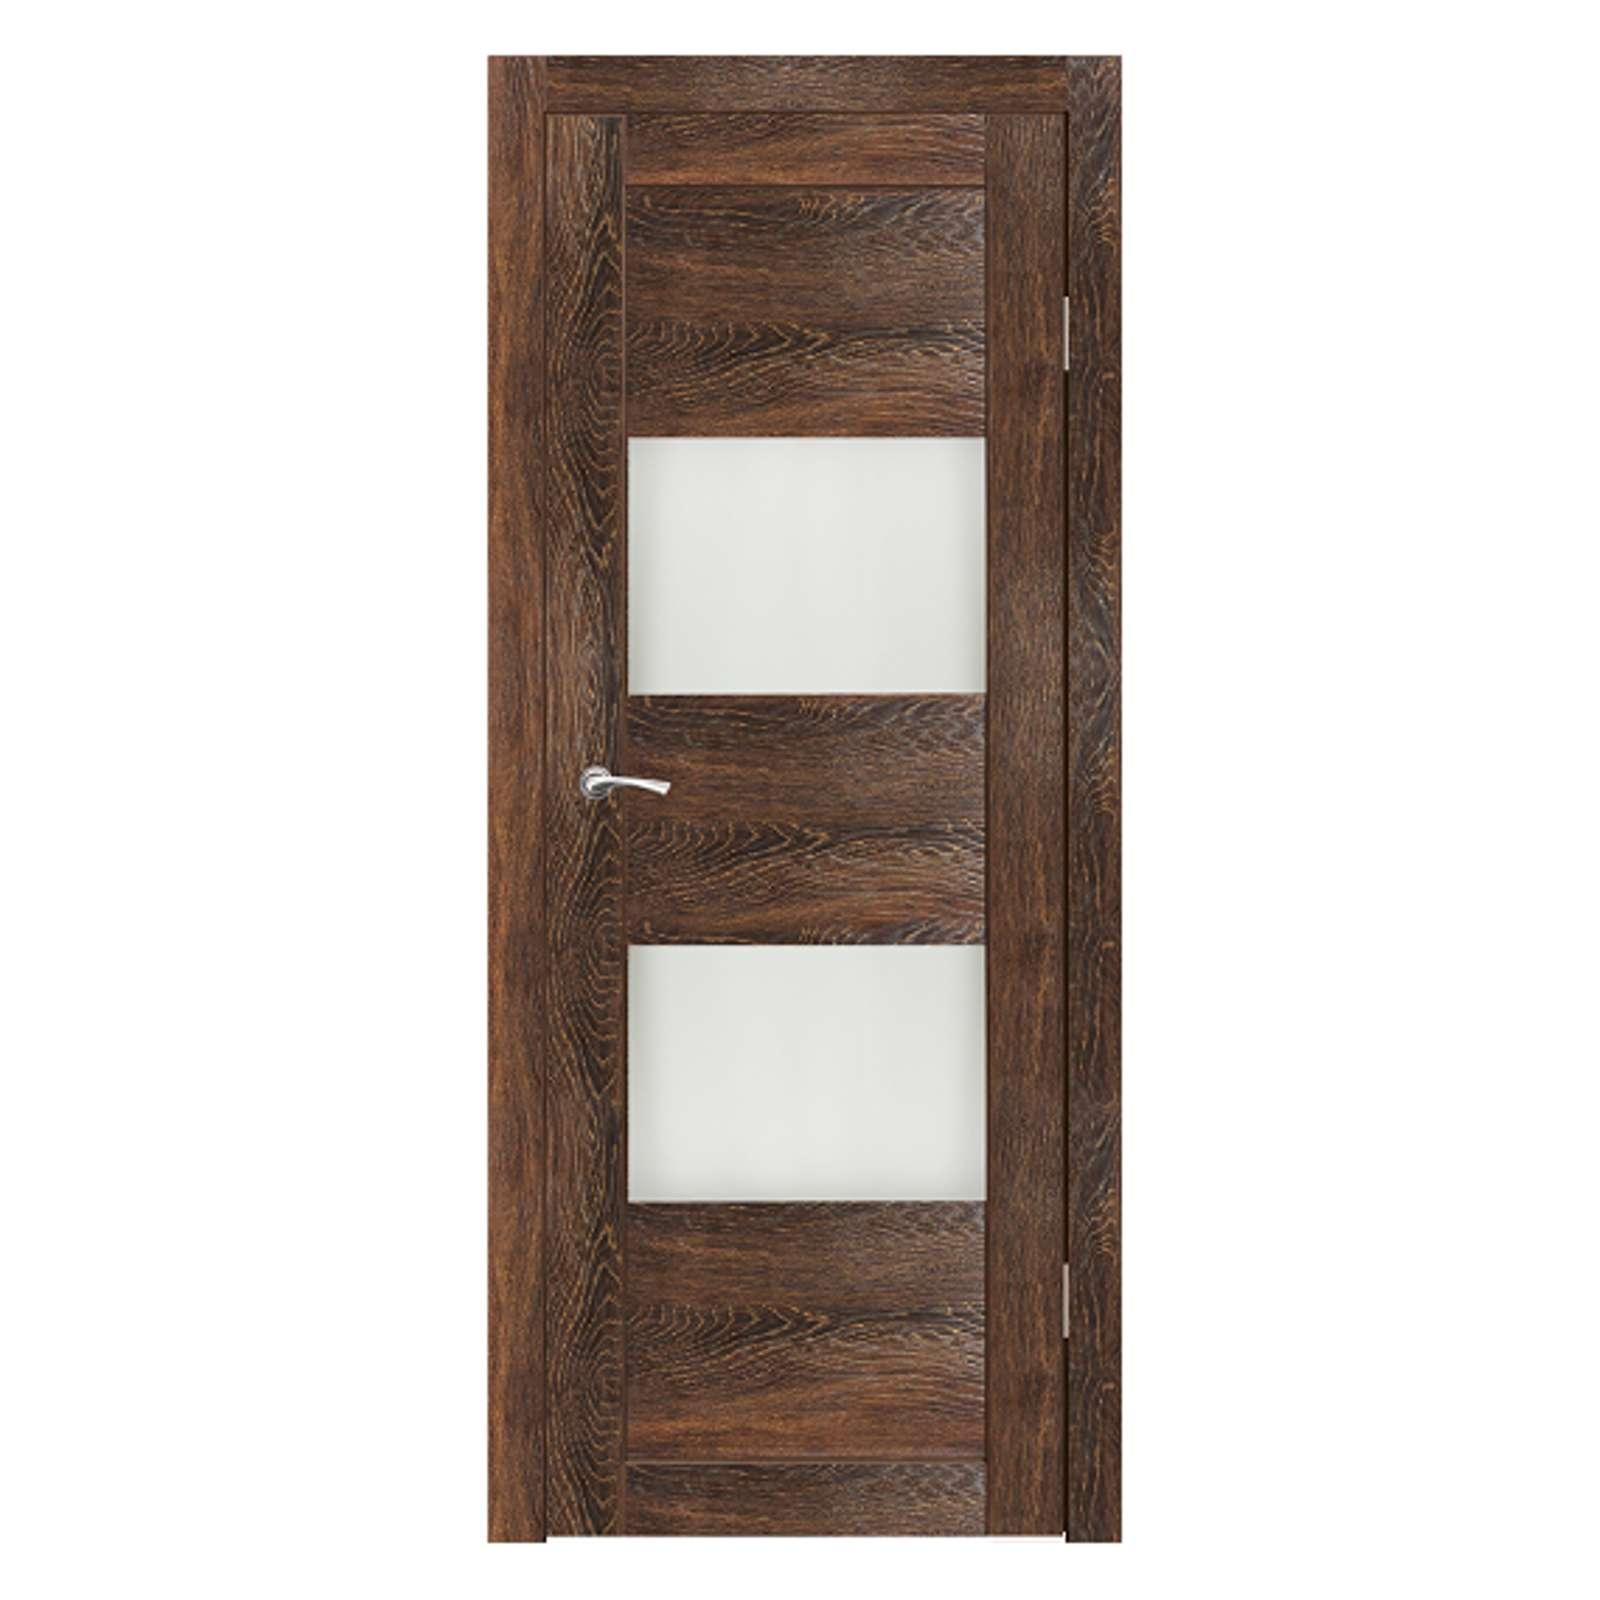 Дверное полотно Синержи Форте, Виски, ПДО 600Х2000ММ